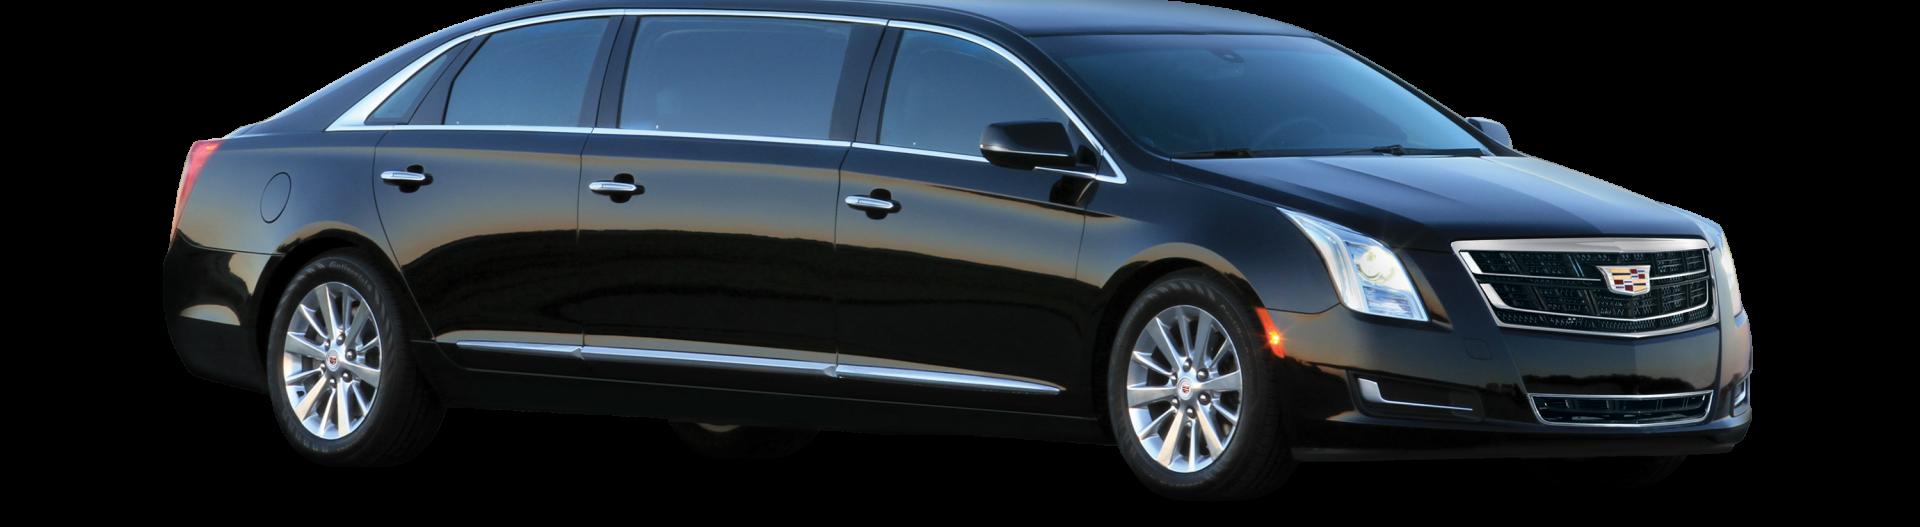 2016 Cadillac XTS Ambassador